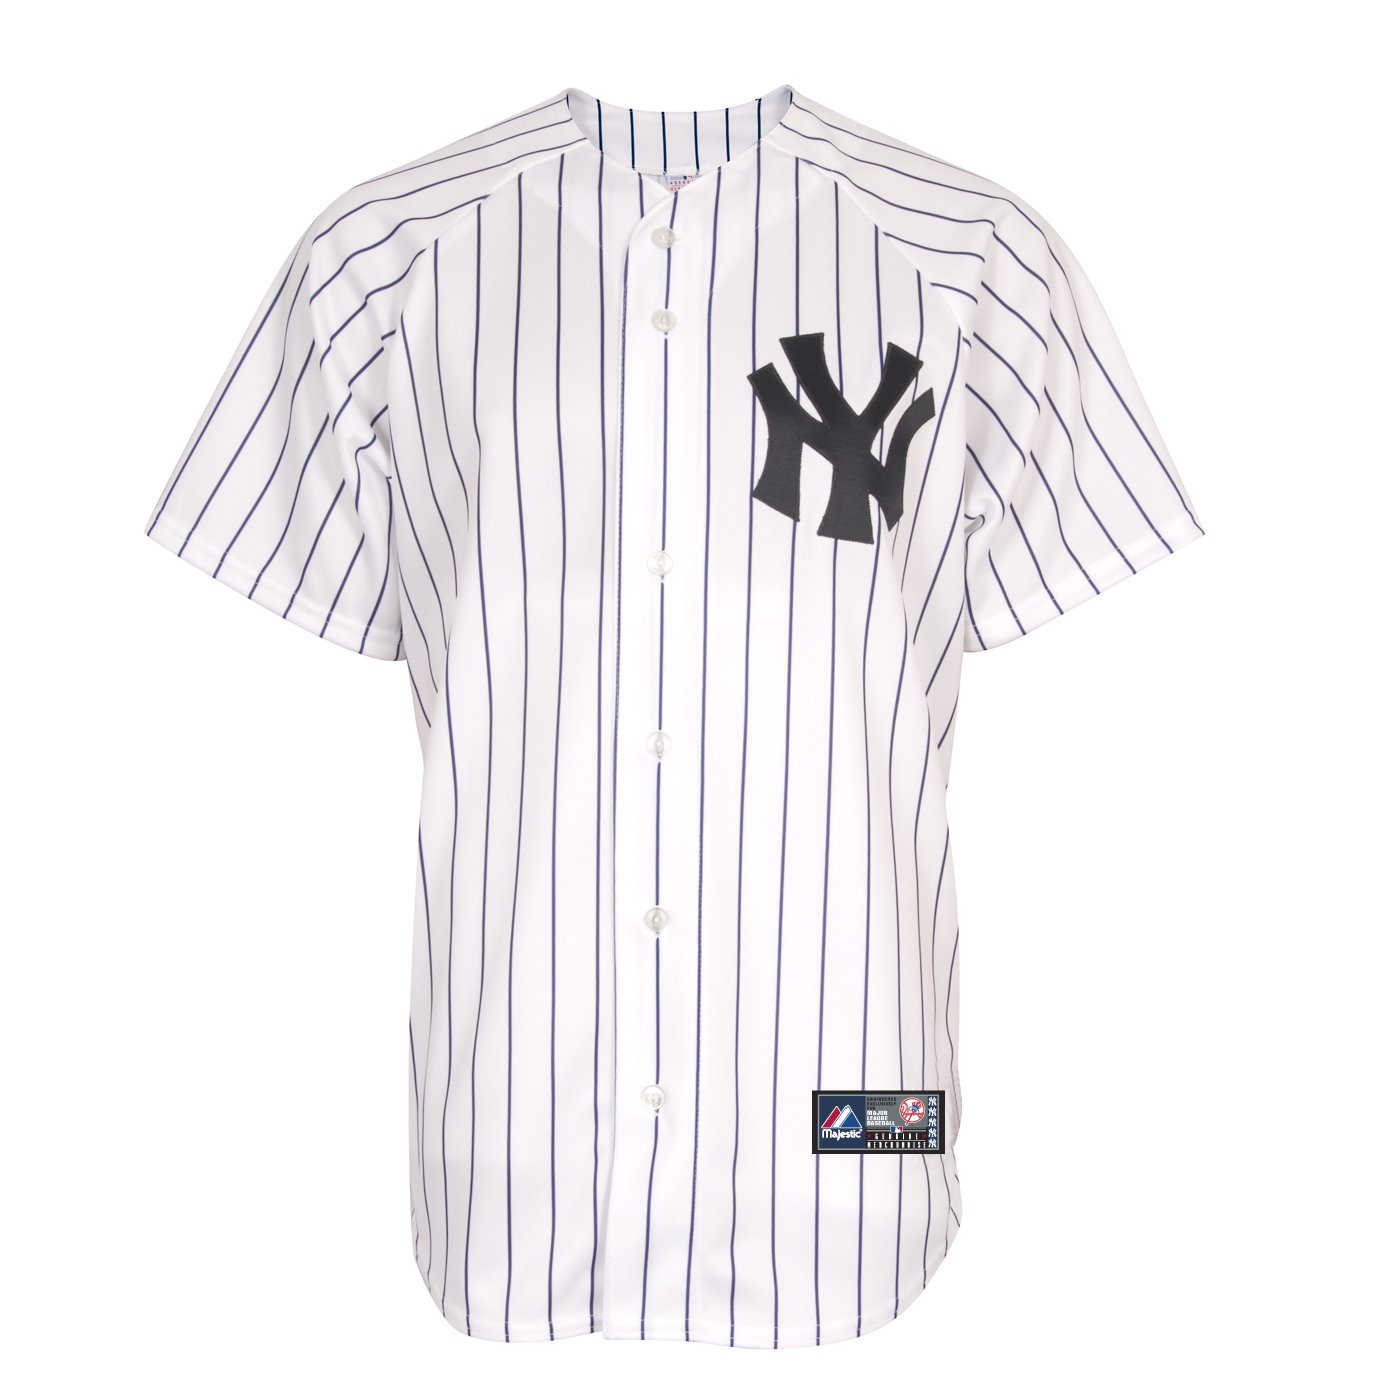 Buy MLB Majestic New York Yankees White Replica Baseball Jersey XXX